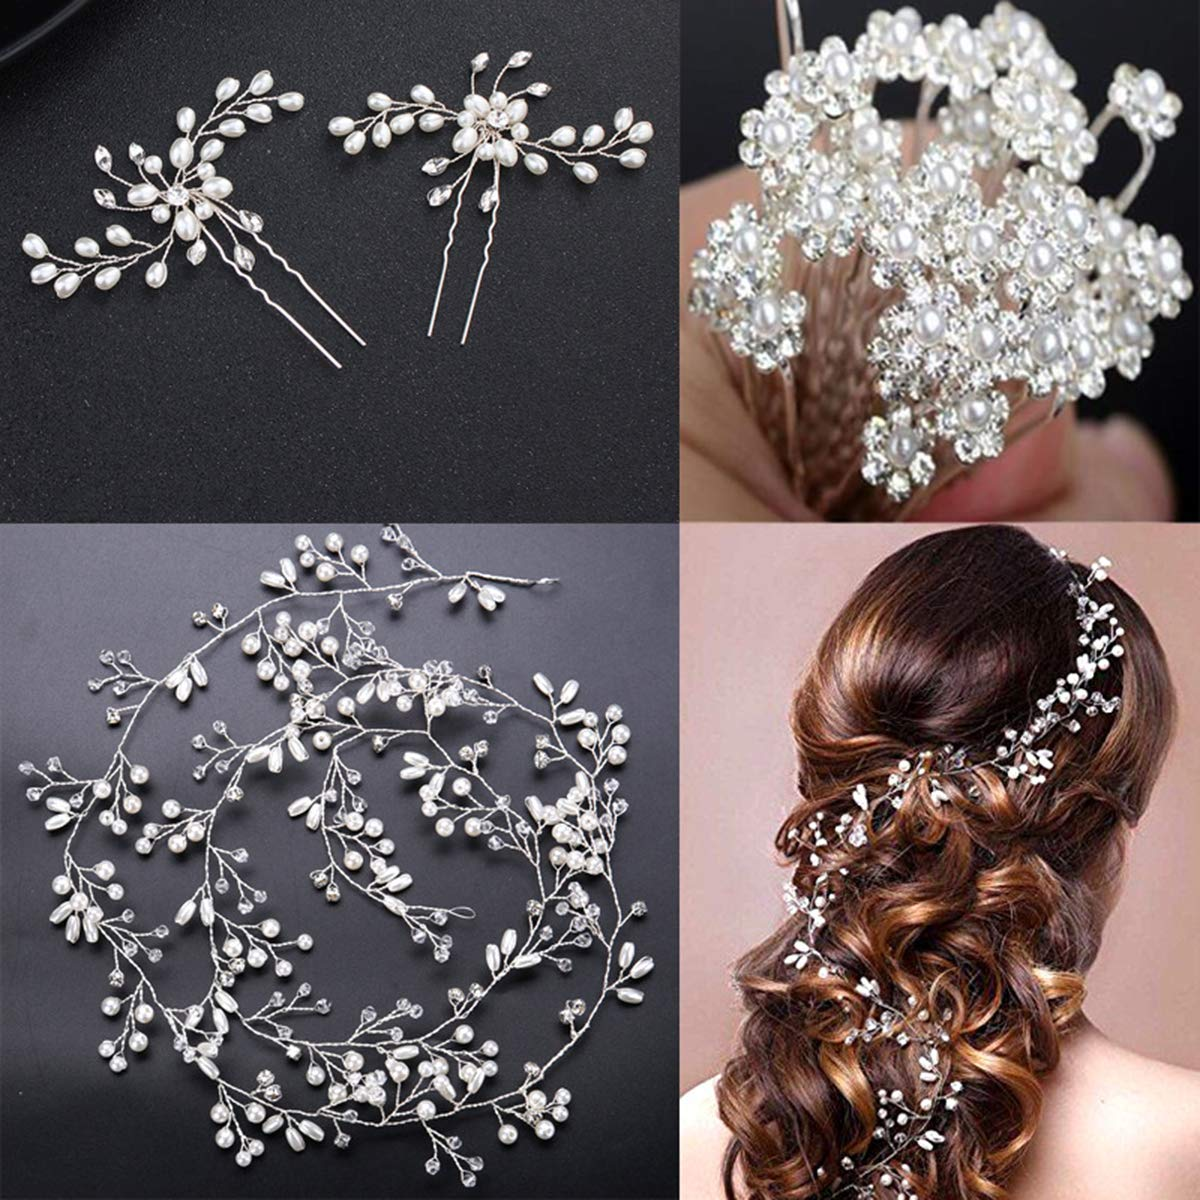 Crystals Bridal Wedding Jewelry Hair Accessories for Women, 1 Pair of Crystal Rhinestone Hair Pins, 20 Pack Pearl Flower Crystal Hair Pins Clips,1 Pack Hair Headpiece Pearl Wedding Hair Vine-Silver VVLife